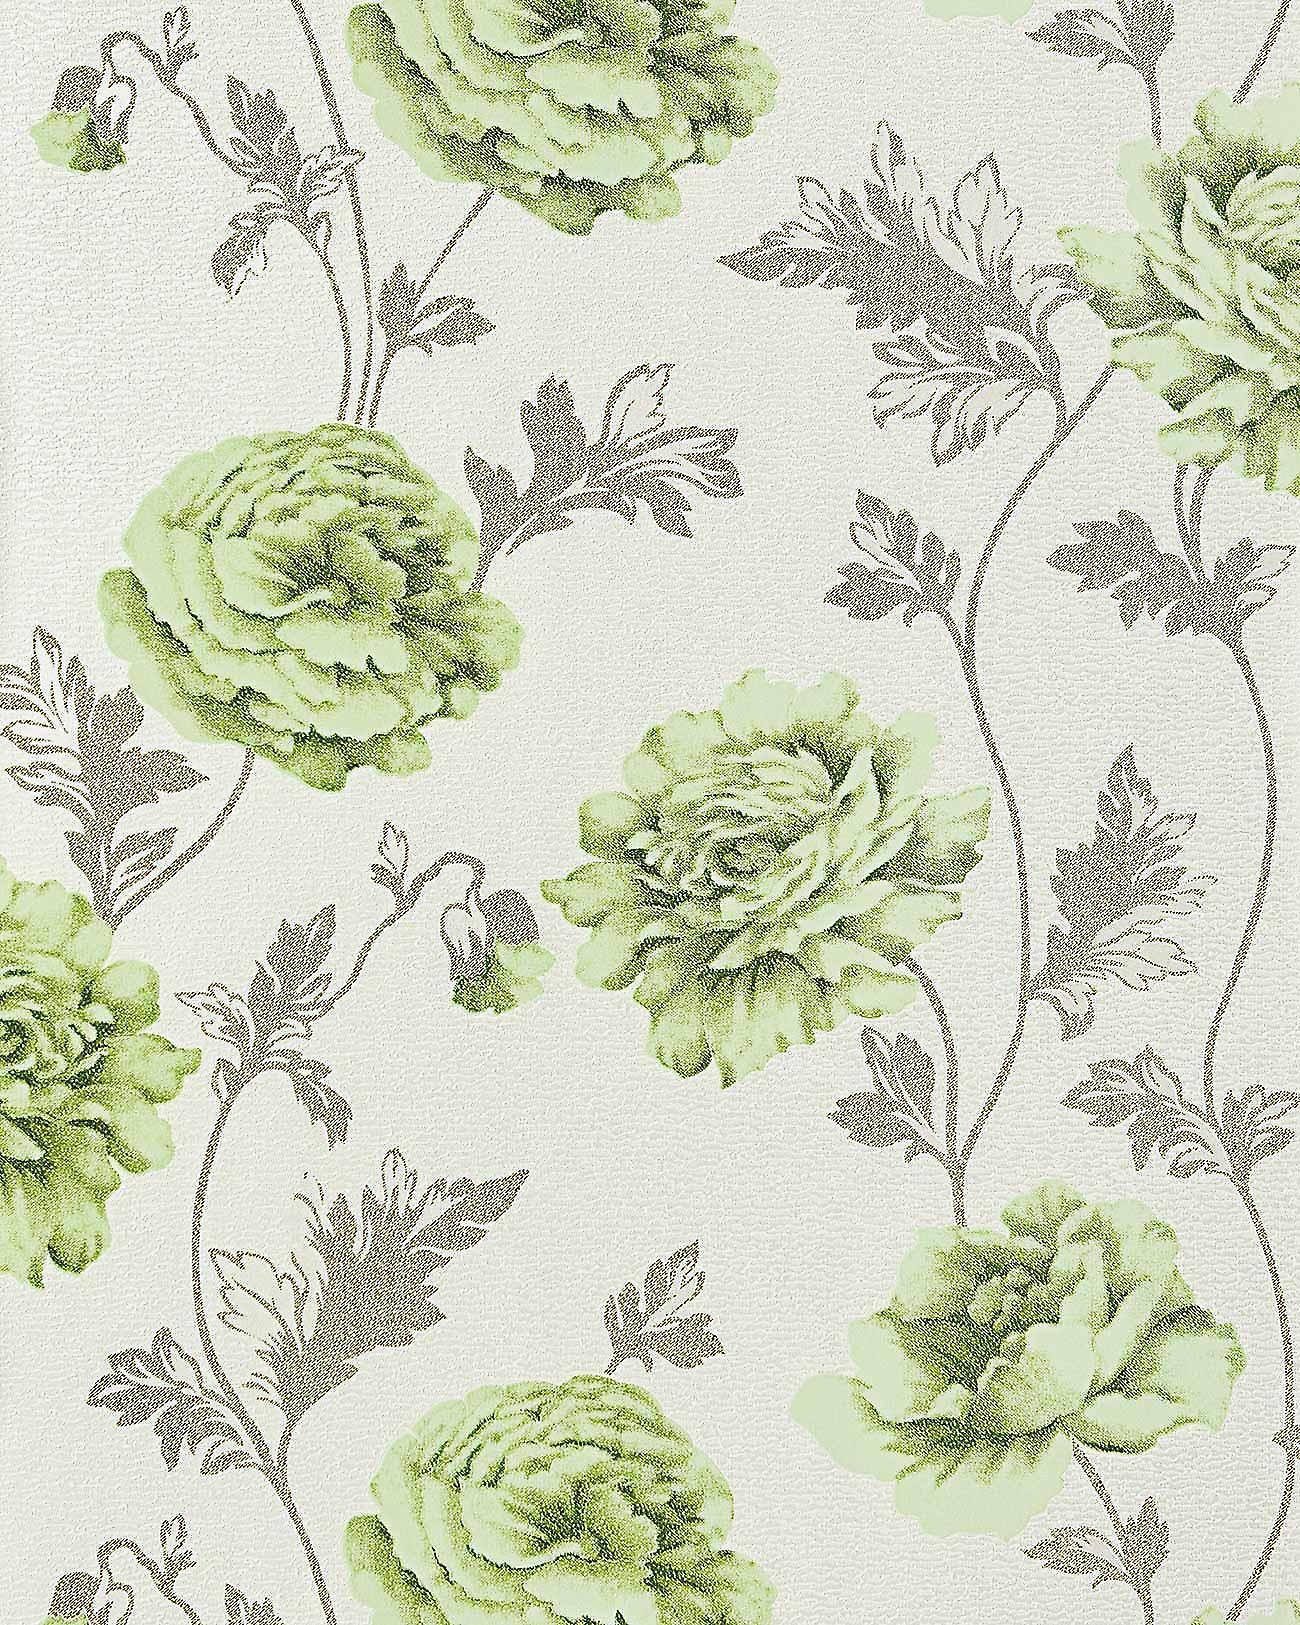 Flowers Wallpaper Country House EDEM 086 25 Romantic Floral Vinyl Roses Crashoptik Light Beige Green